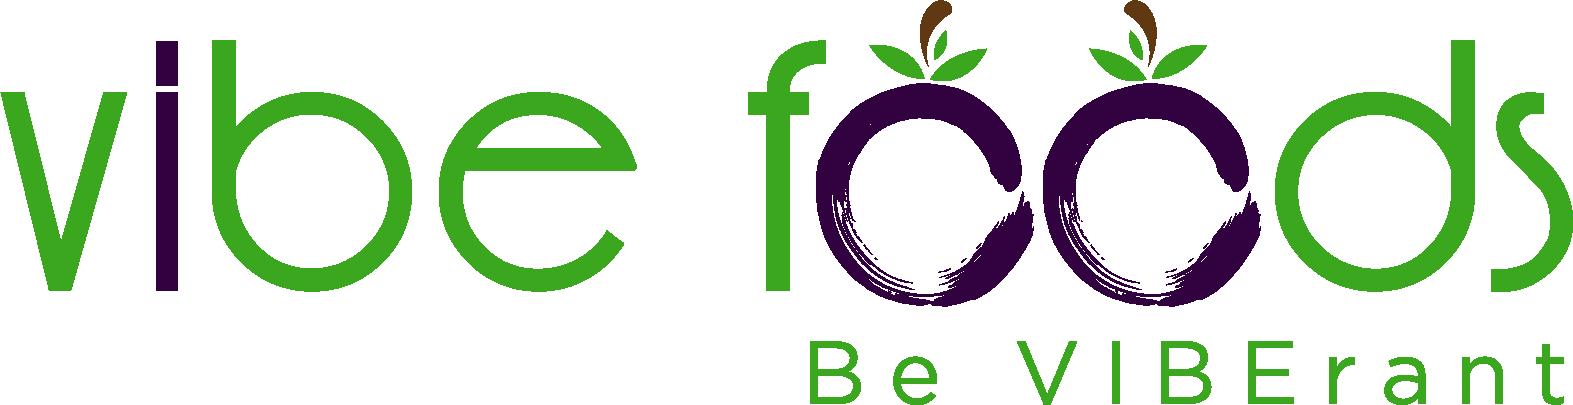 Vibe Foods